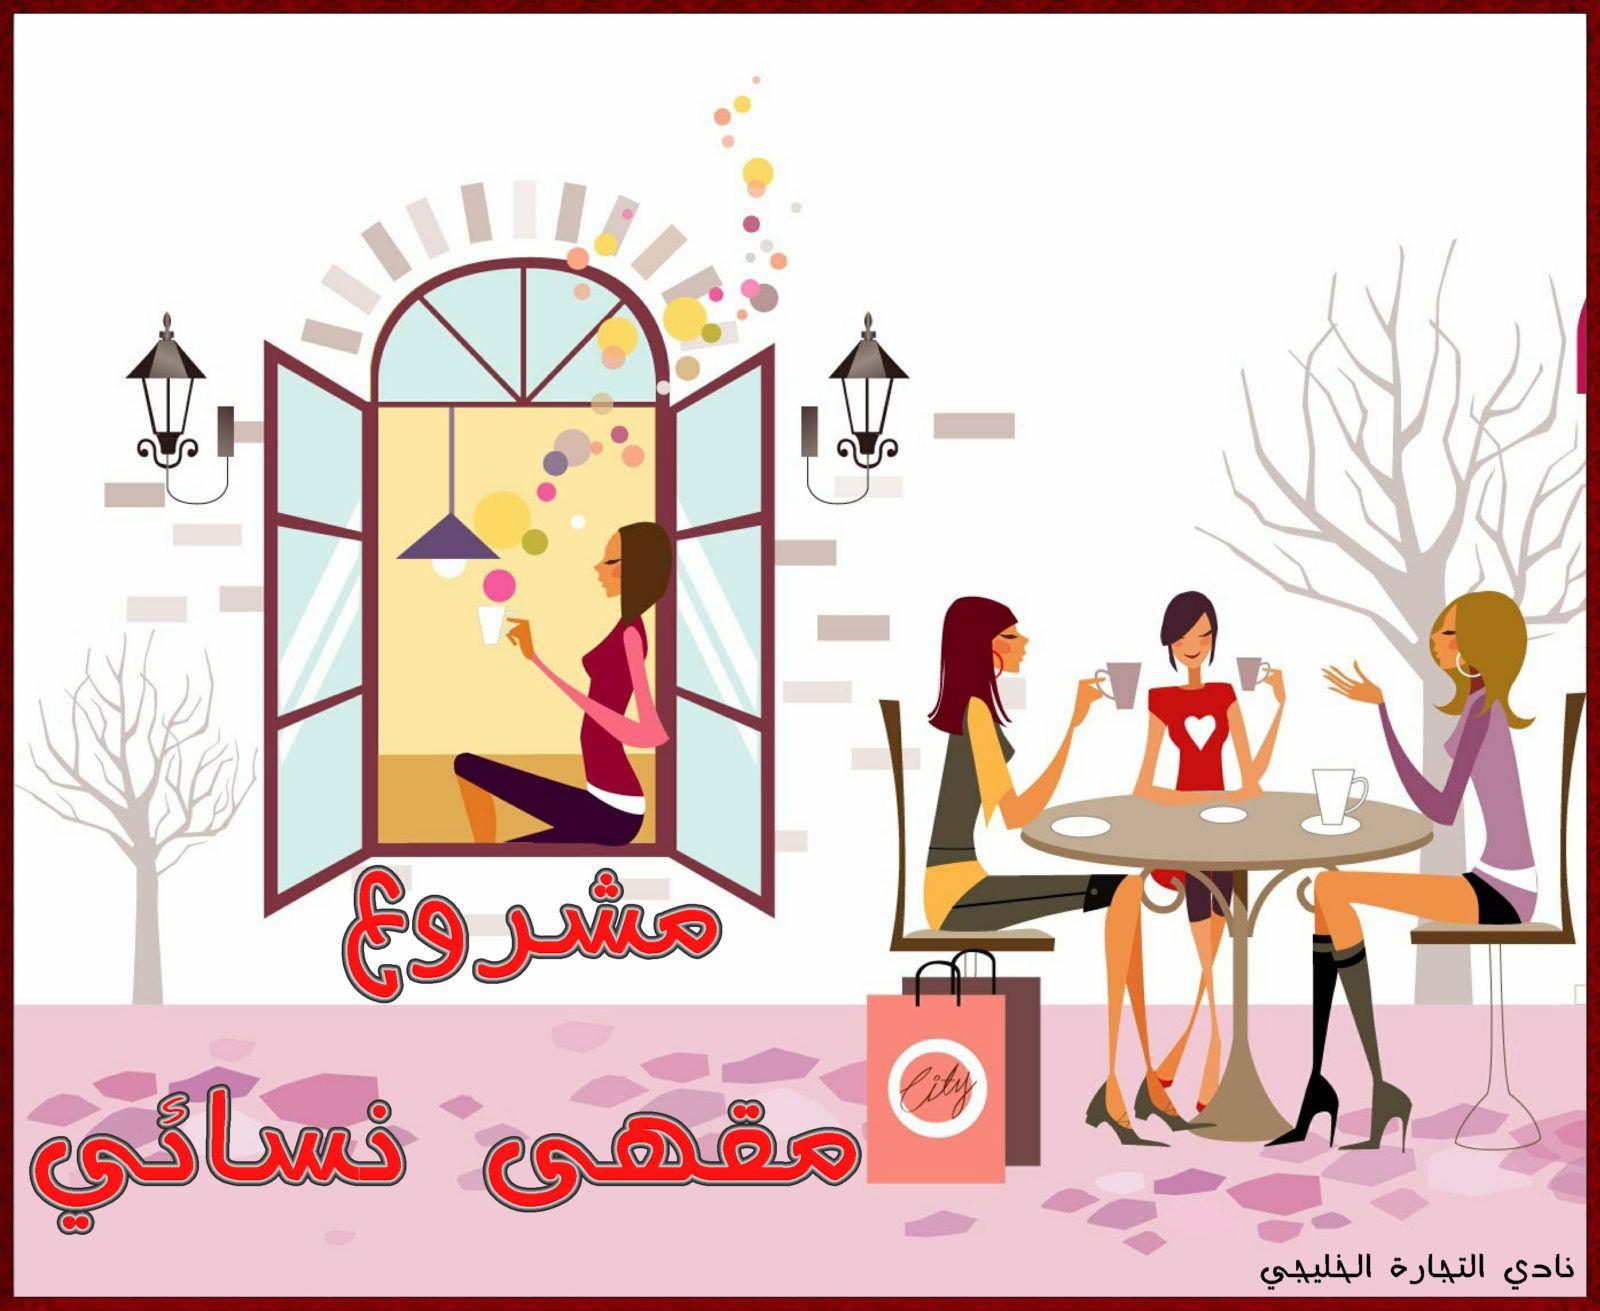 مشاريع ناجحة للنساء Home Decor Decals Decor Projects